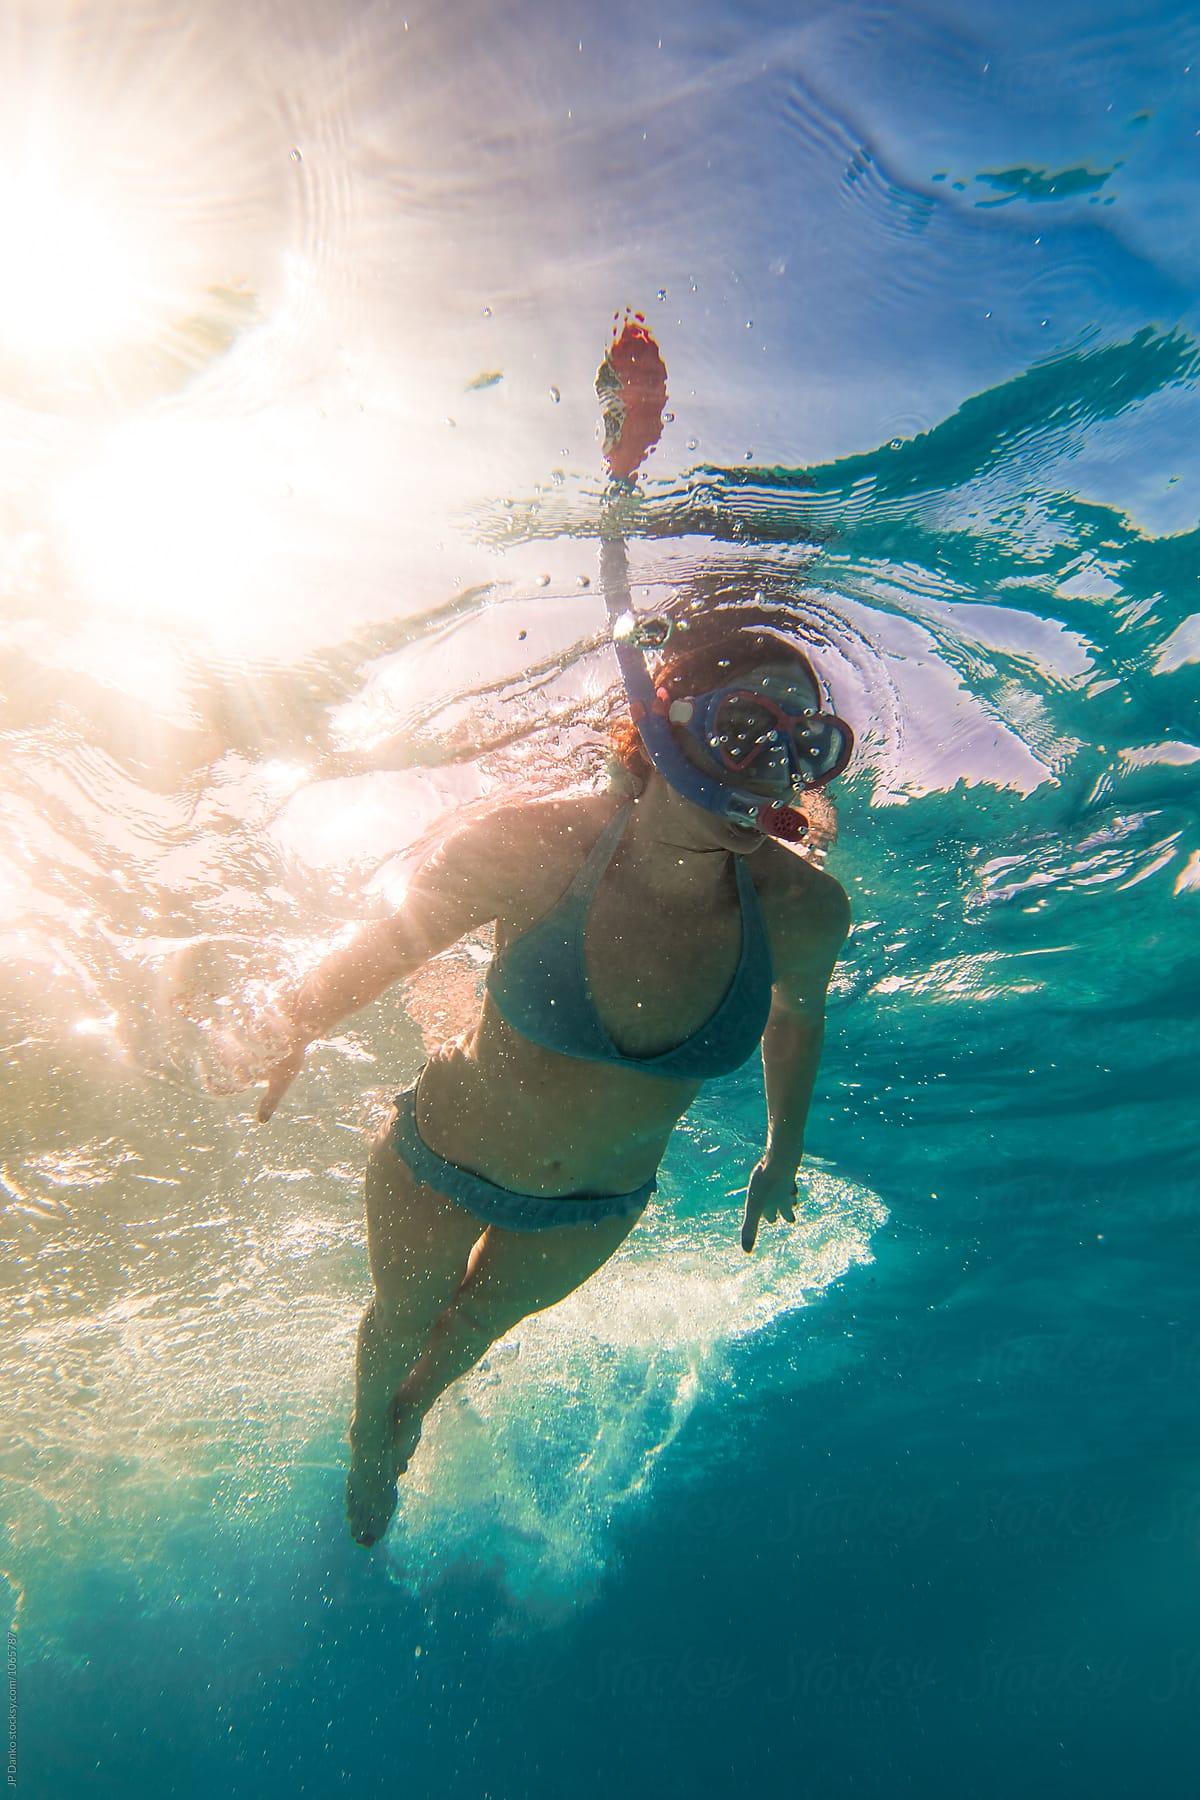 Woman In Bikini Snorkeling Underwater at All Inclusive Caribbean Resort  White Sand Beach by JP Danko